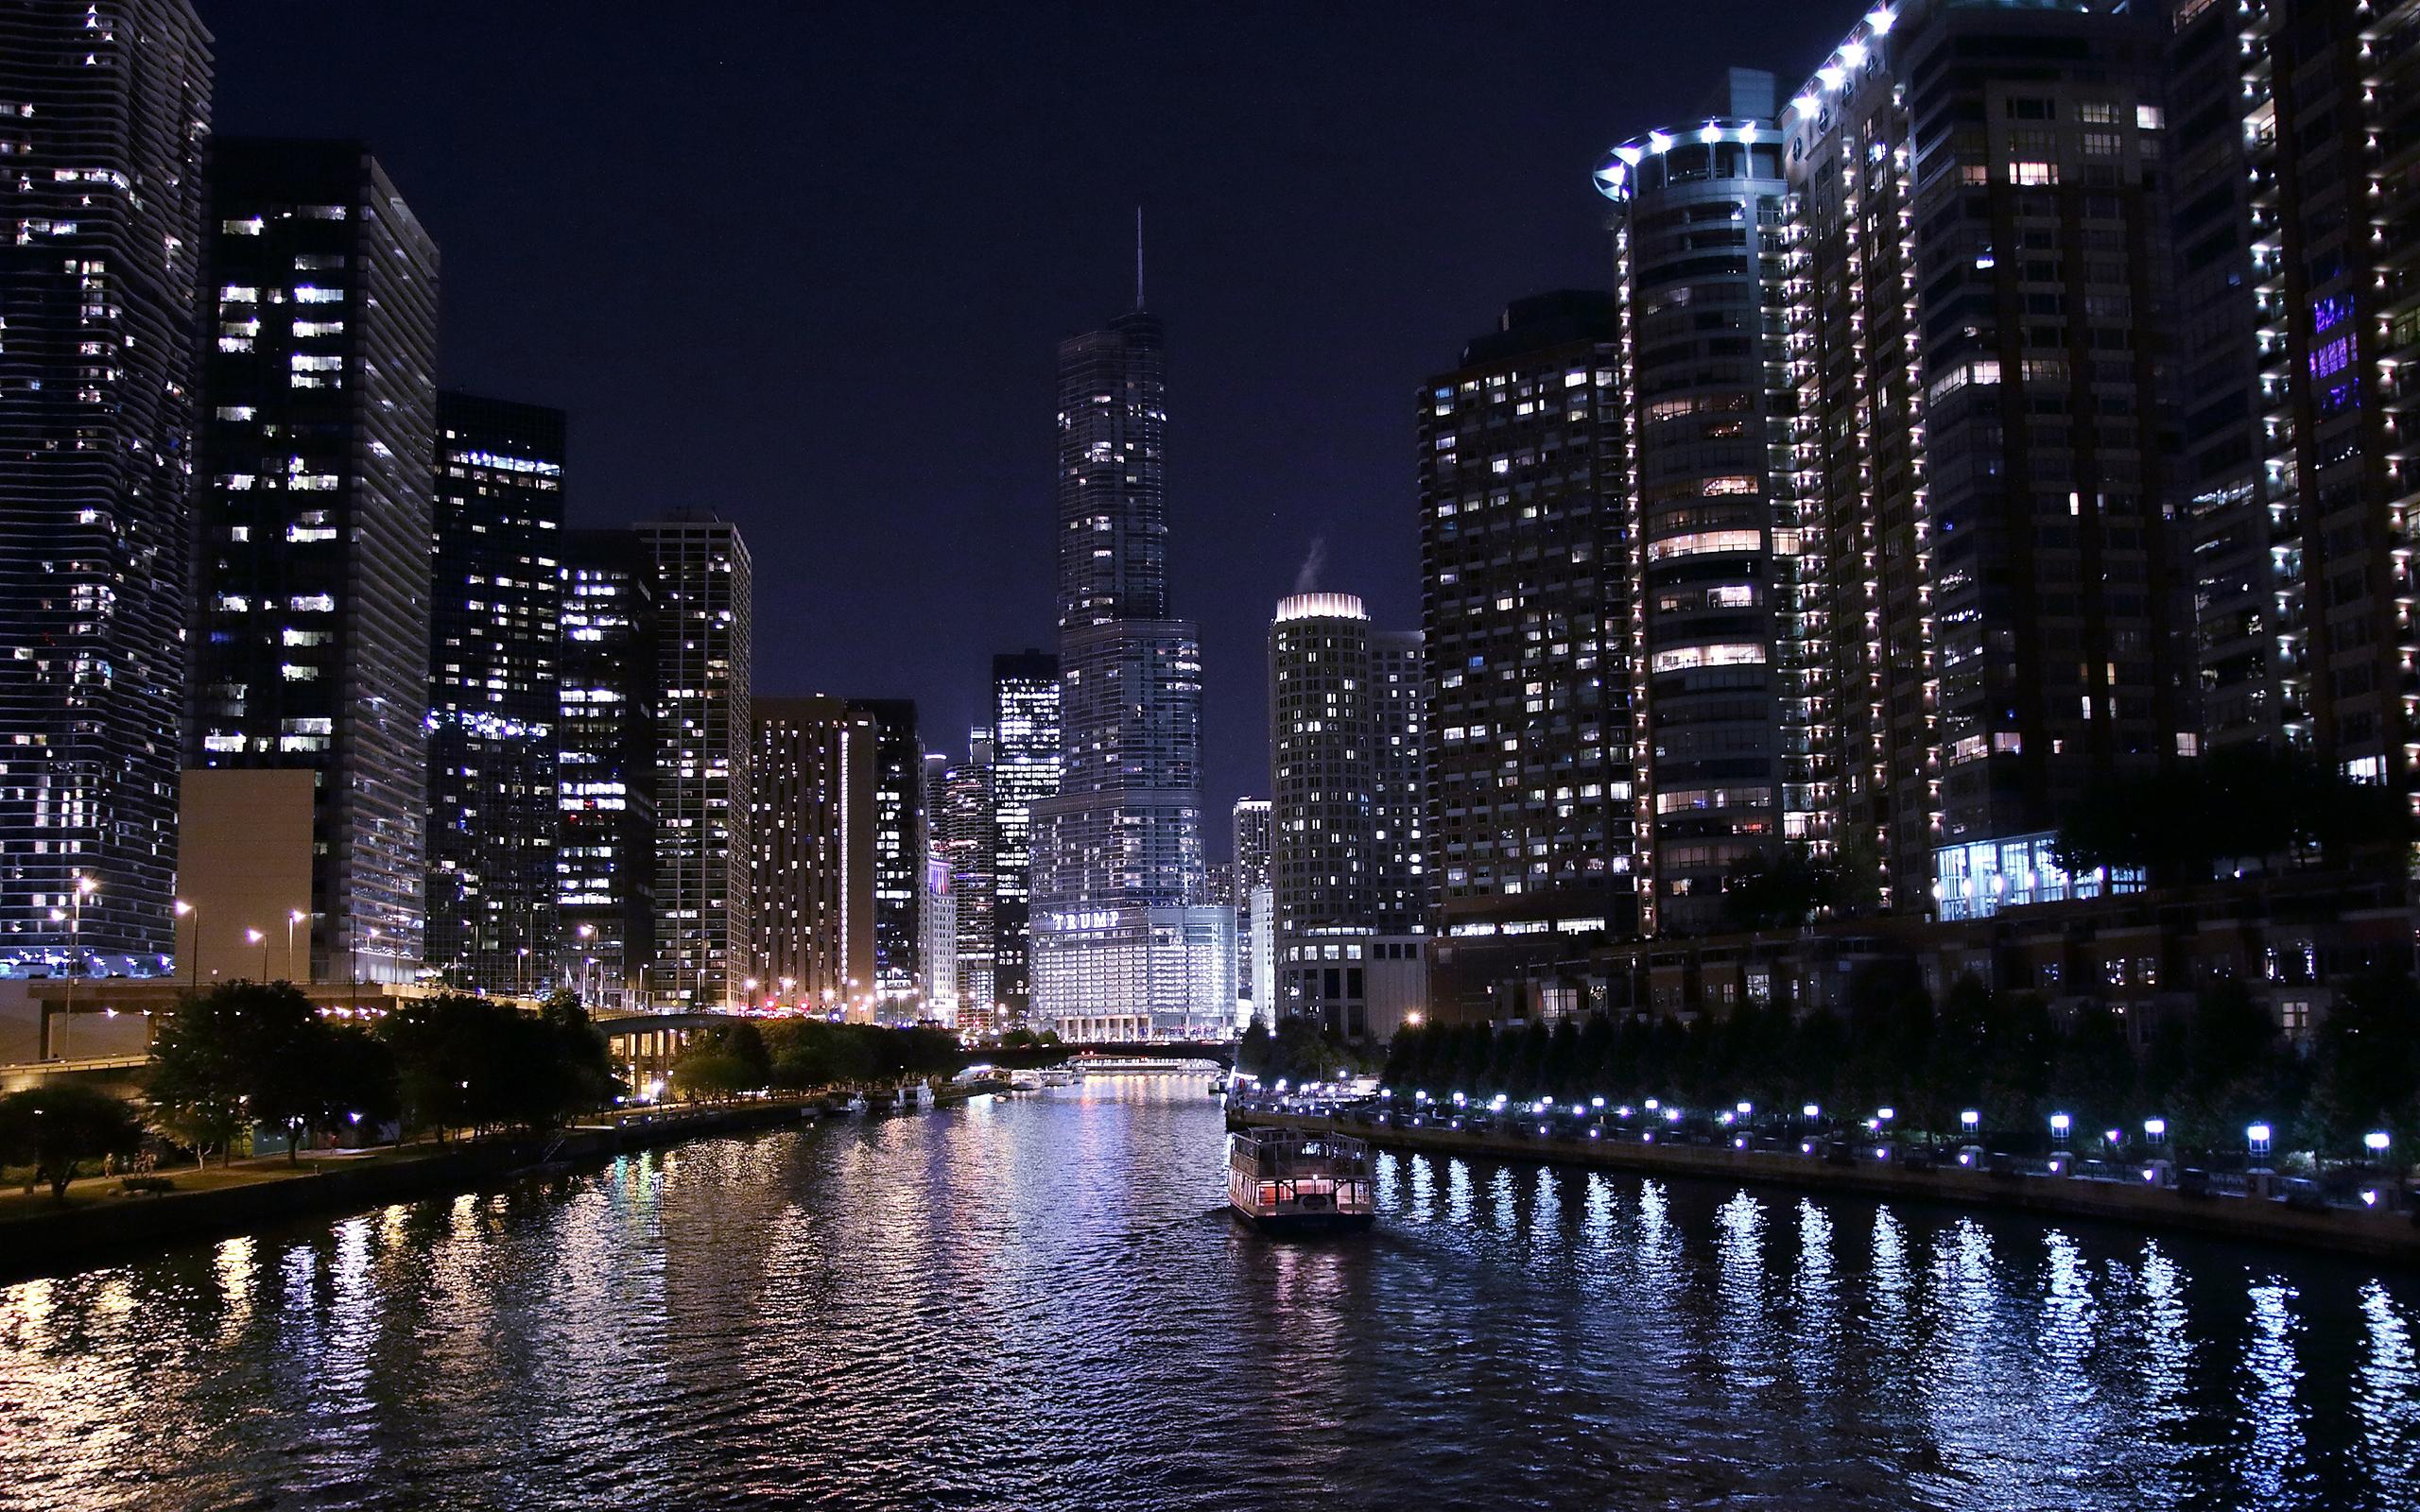 Fond d'ecran River by night - Wallpaper